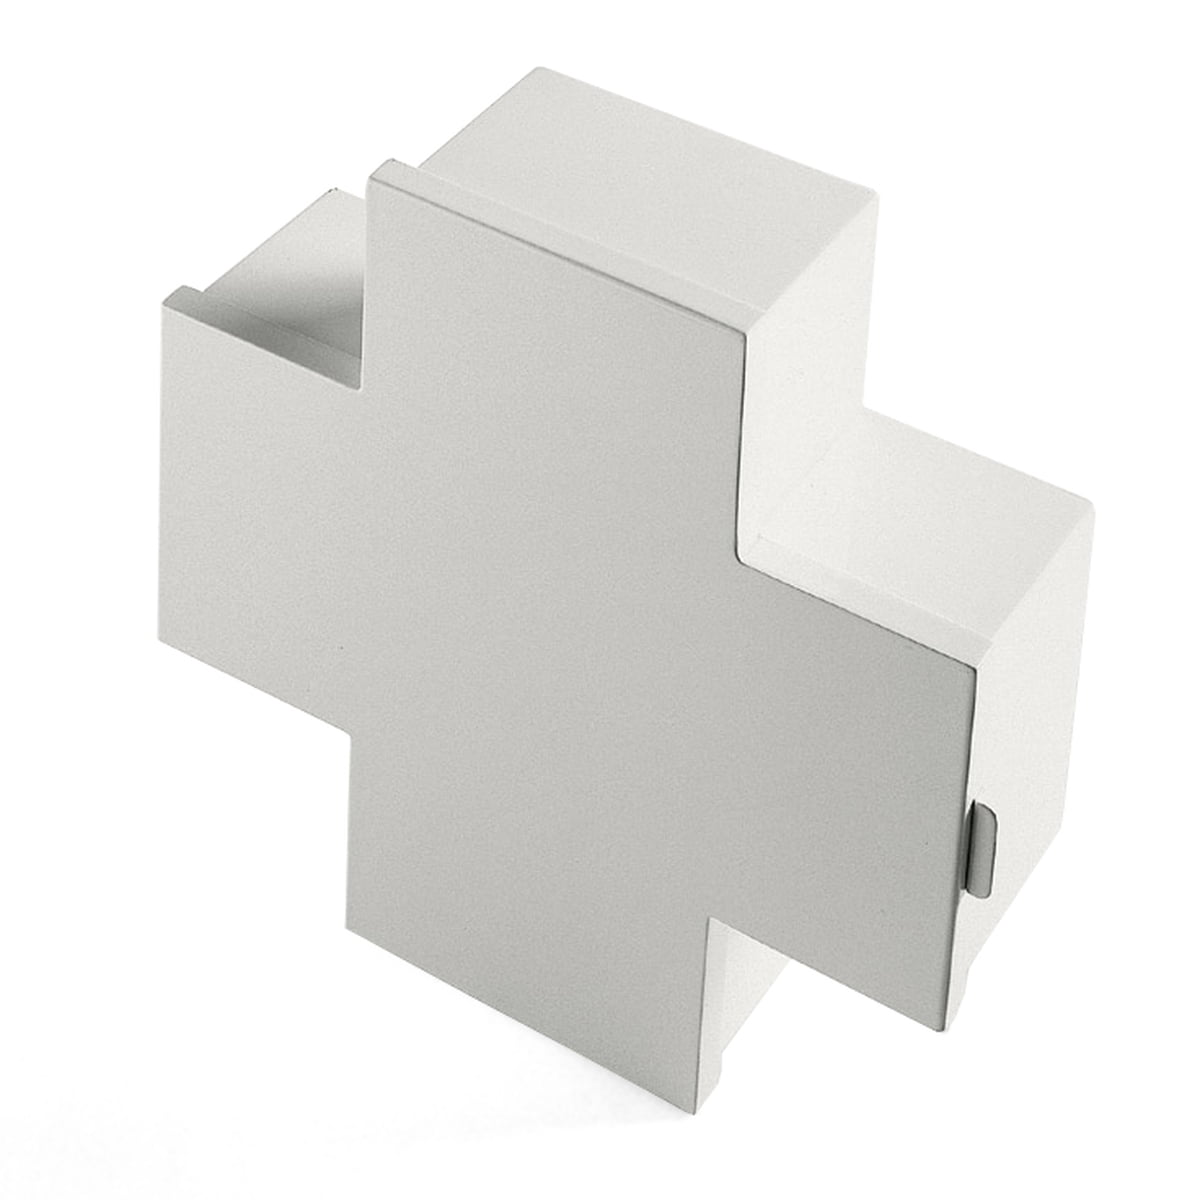 Cappellini - Progetto Oggetto Medizinschrank PO/9208B, weiß | Bad > Badmöbel > Medizinschränke | Weiß | Lackiertes metall | Cappellini